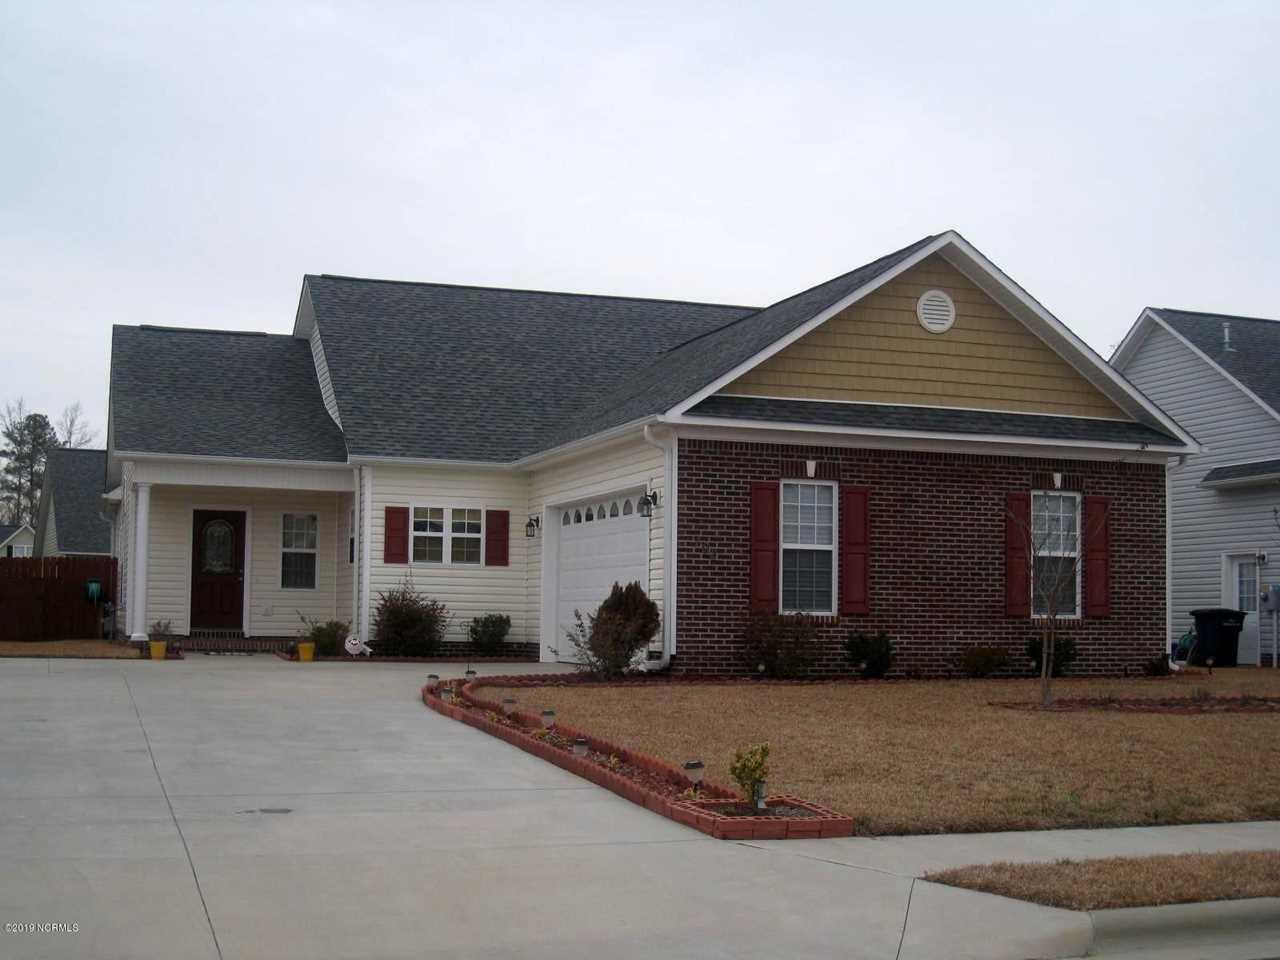 102 Ravenscroft Way Jacksonville, NC 28540 | MLS 100145770 Photo 1